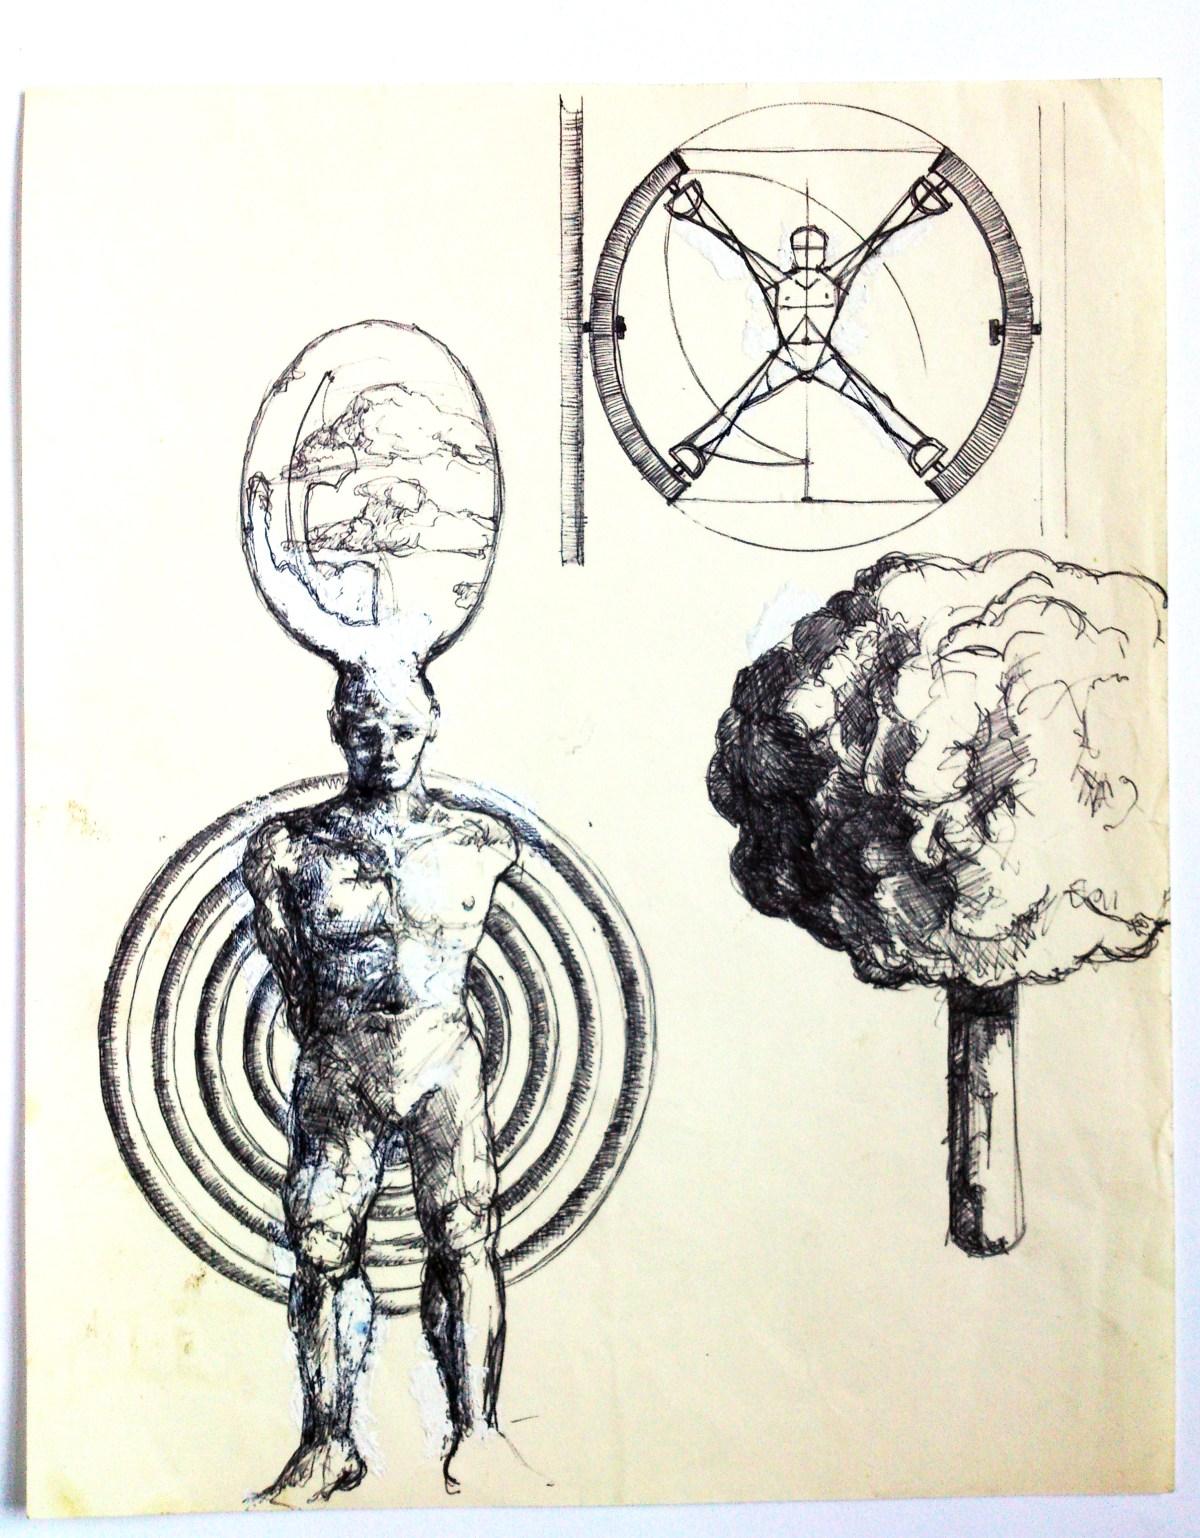 Benjamin Oliver Sketch 01_DSC_0566